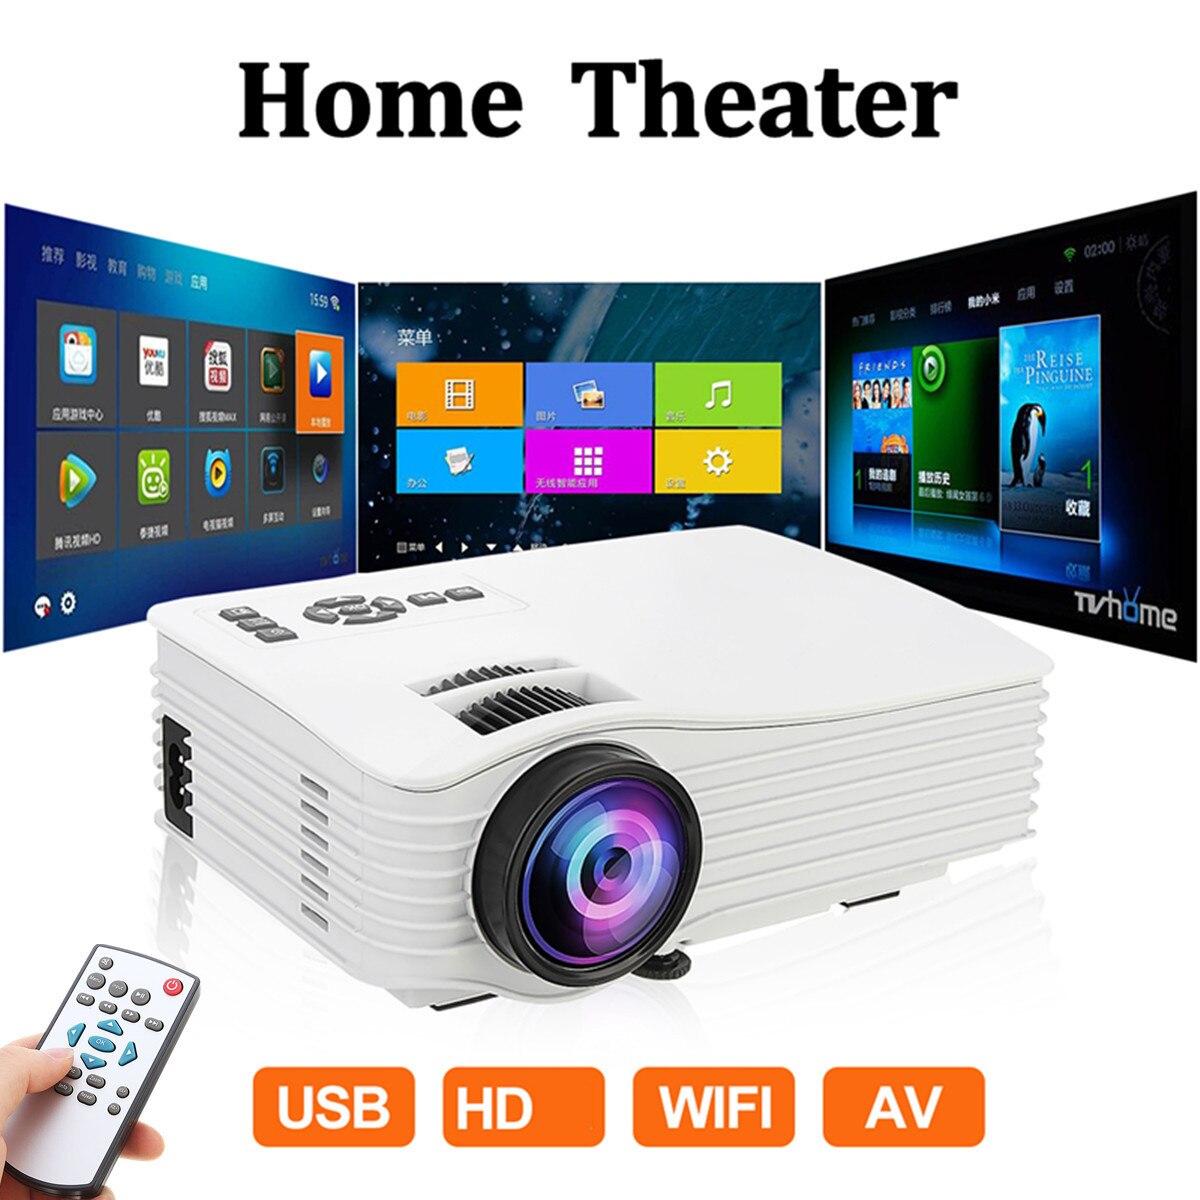 Proyector LED Full HD 1080P Mini Proyector 640x480 teléfono Proyector 4k en casa teatro apoyo Android Ios para cine en casa Para One plus 5T vidrio templado para OnePLus 3 3T Protector de pantalla 2.5D película de vidrio protectora completa para OnePlus 5 5T 1 + 5 t 6